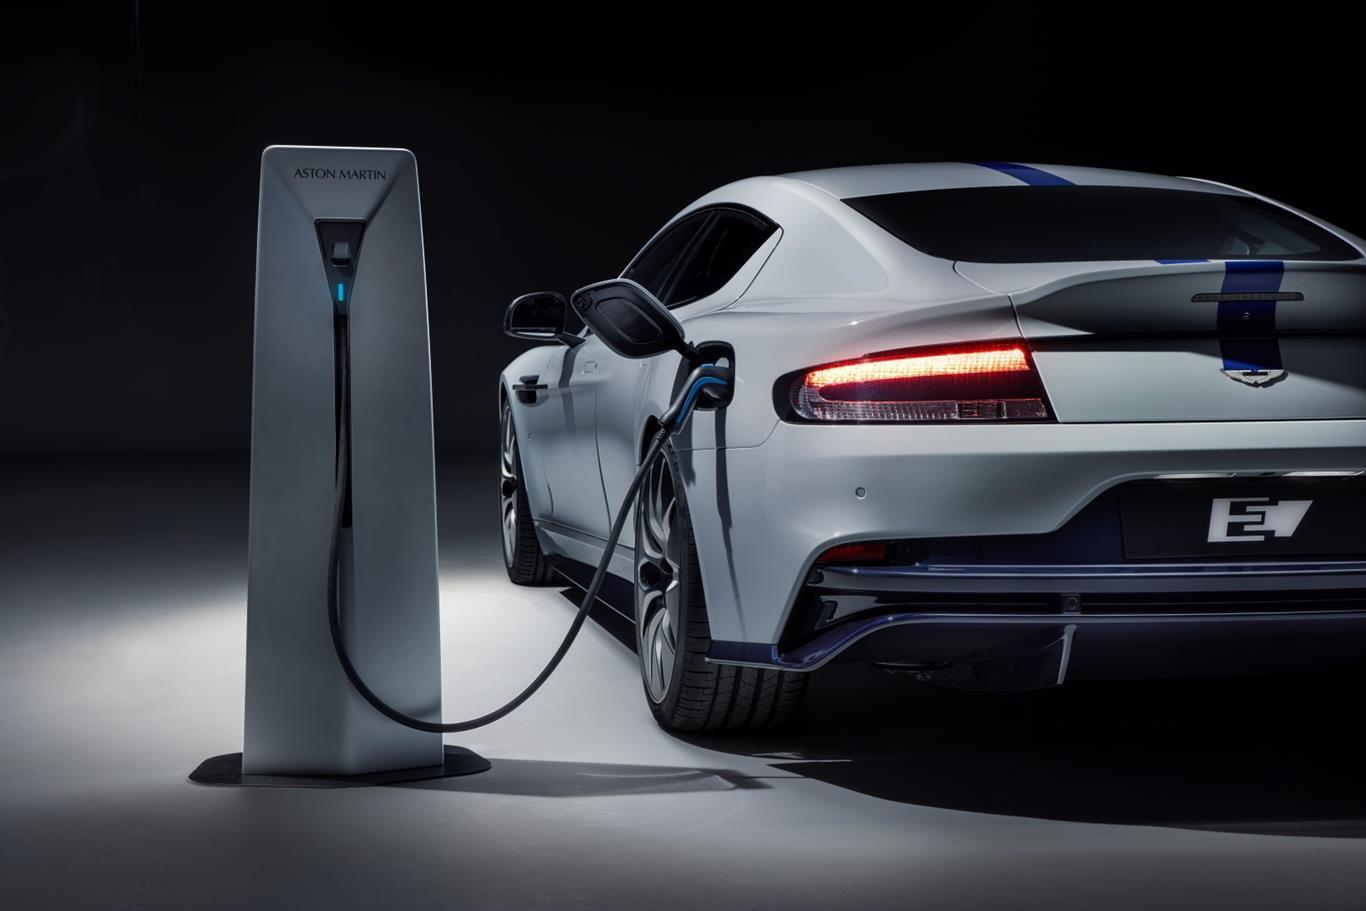 Without Fresh Capital, It May Soon Be 'Time To Die' For Aston Martin - Aston Martin Lagonda Global Holdings plc (OTCMKTS:AMGDF) | Seeking Alpha